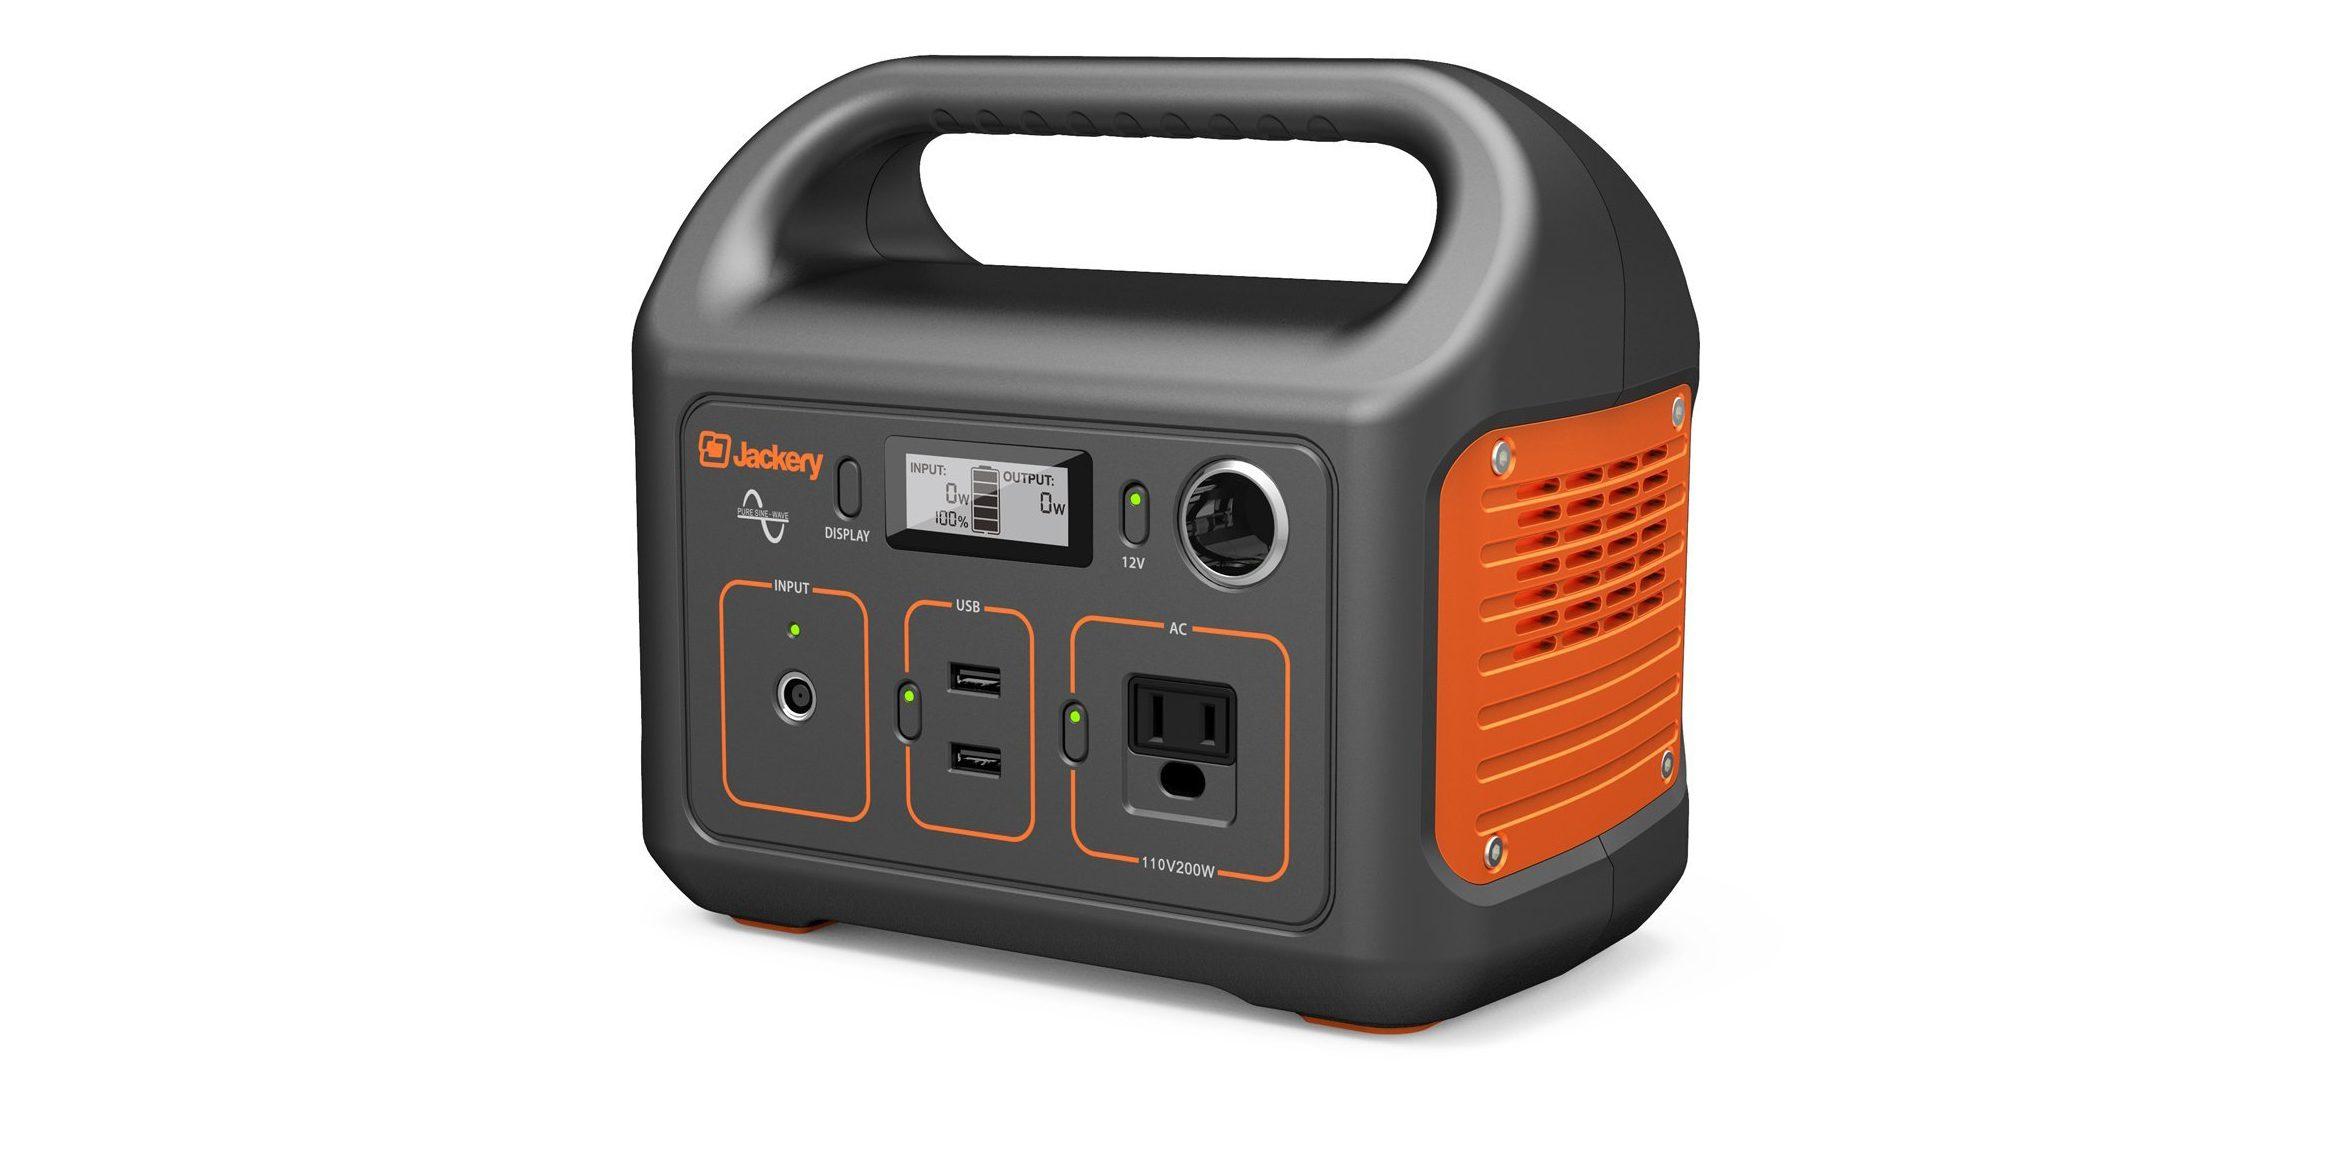 Jackery's Portable Power Station has AC, DC, and USB w/ a 67000mAh battery: $250 (Reg. $300)